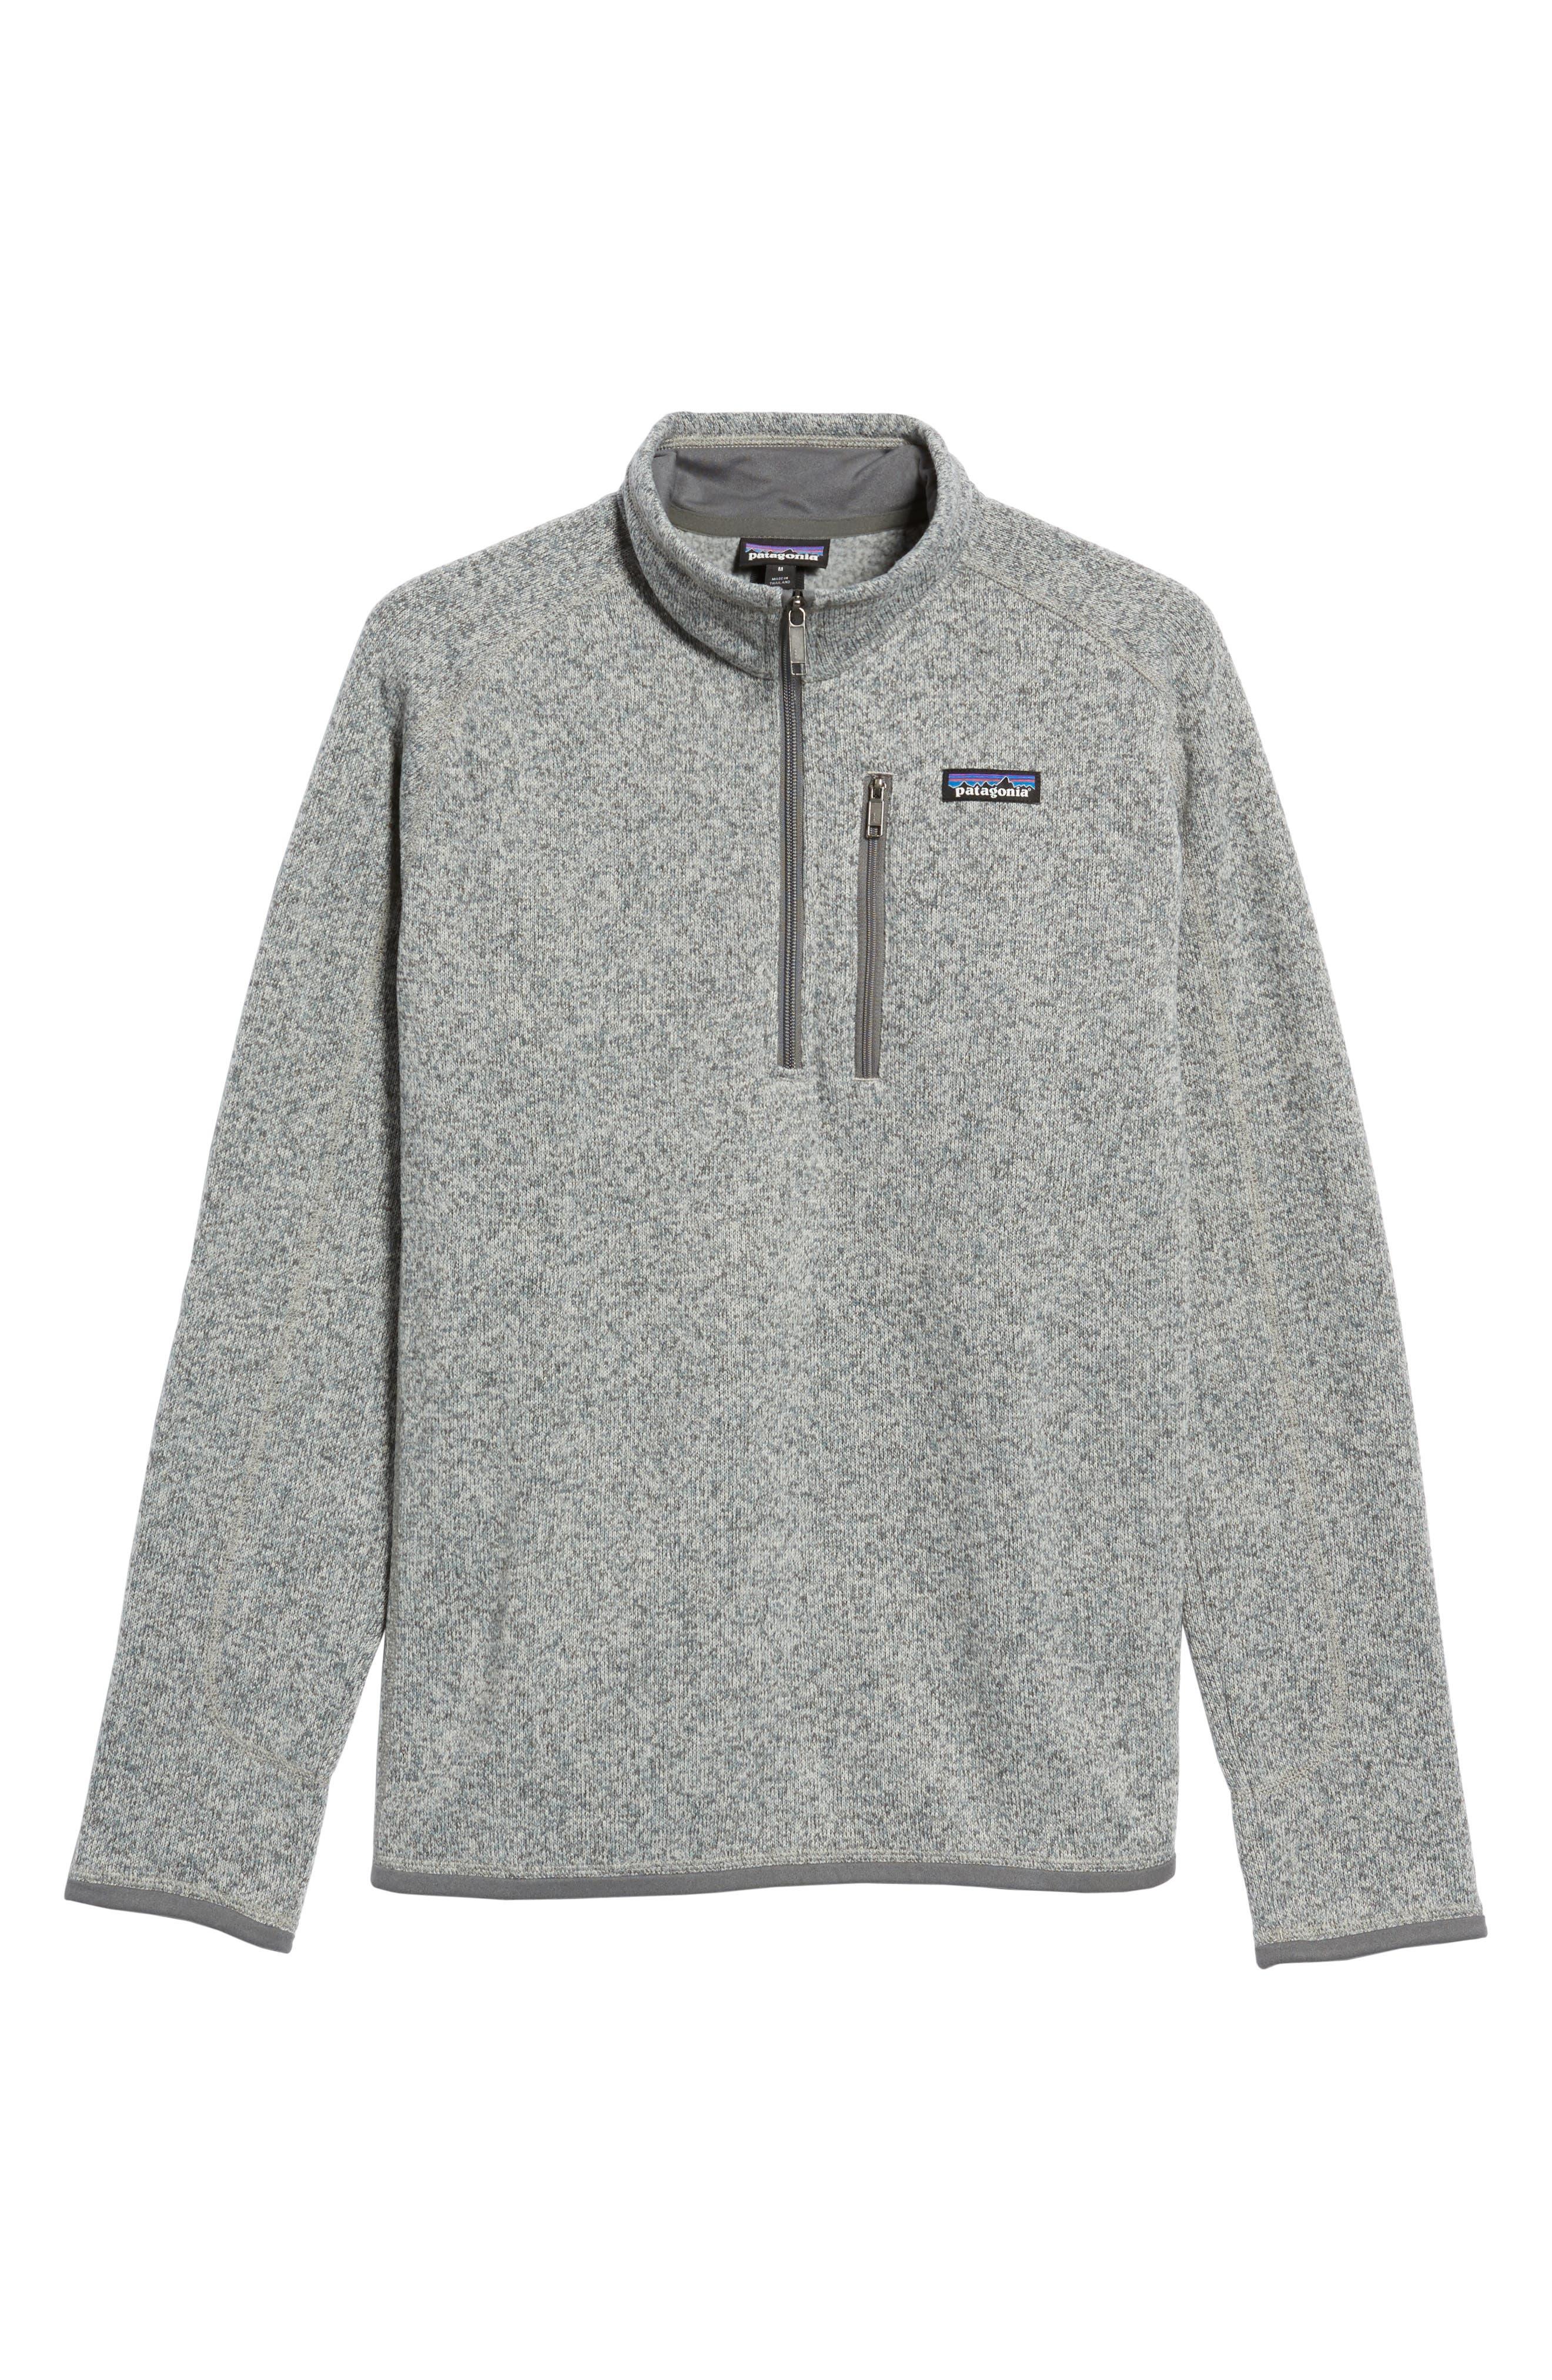 Patagonia Better Sweater Quarter Zip Fleece Lined Pullover, Grey